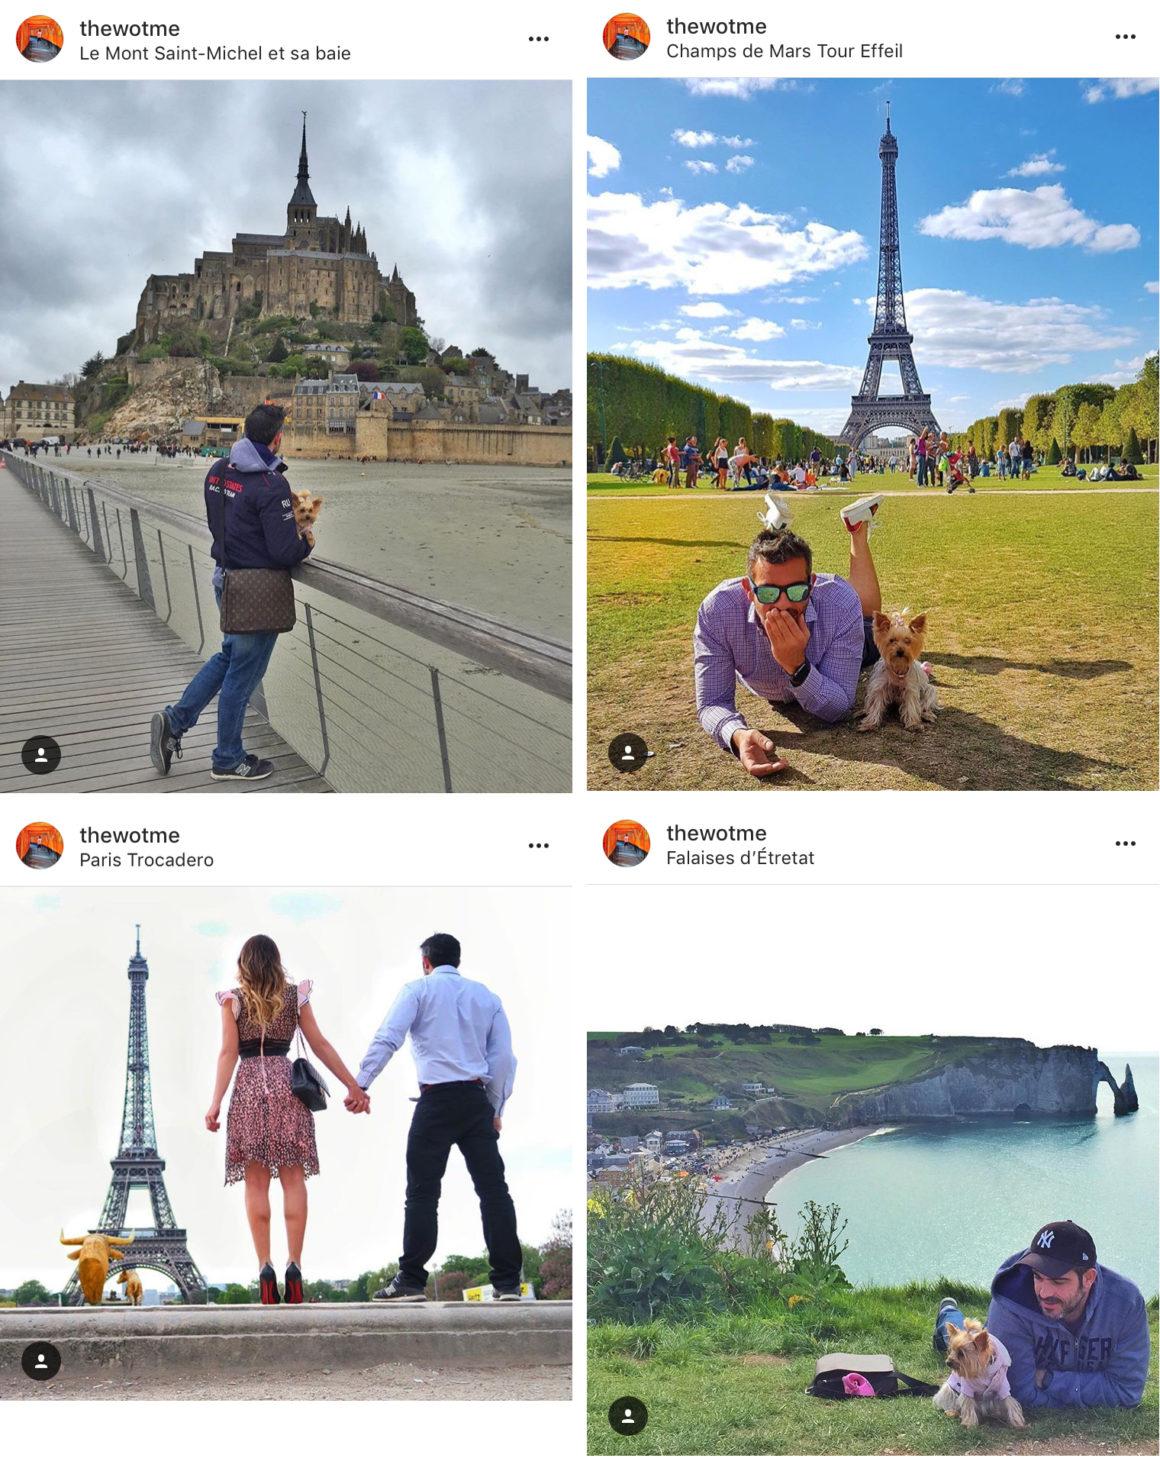 memoria de viajes 2017 - FRANCIA 1160x1458 - Memoria de Viajes 2017